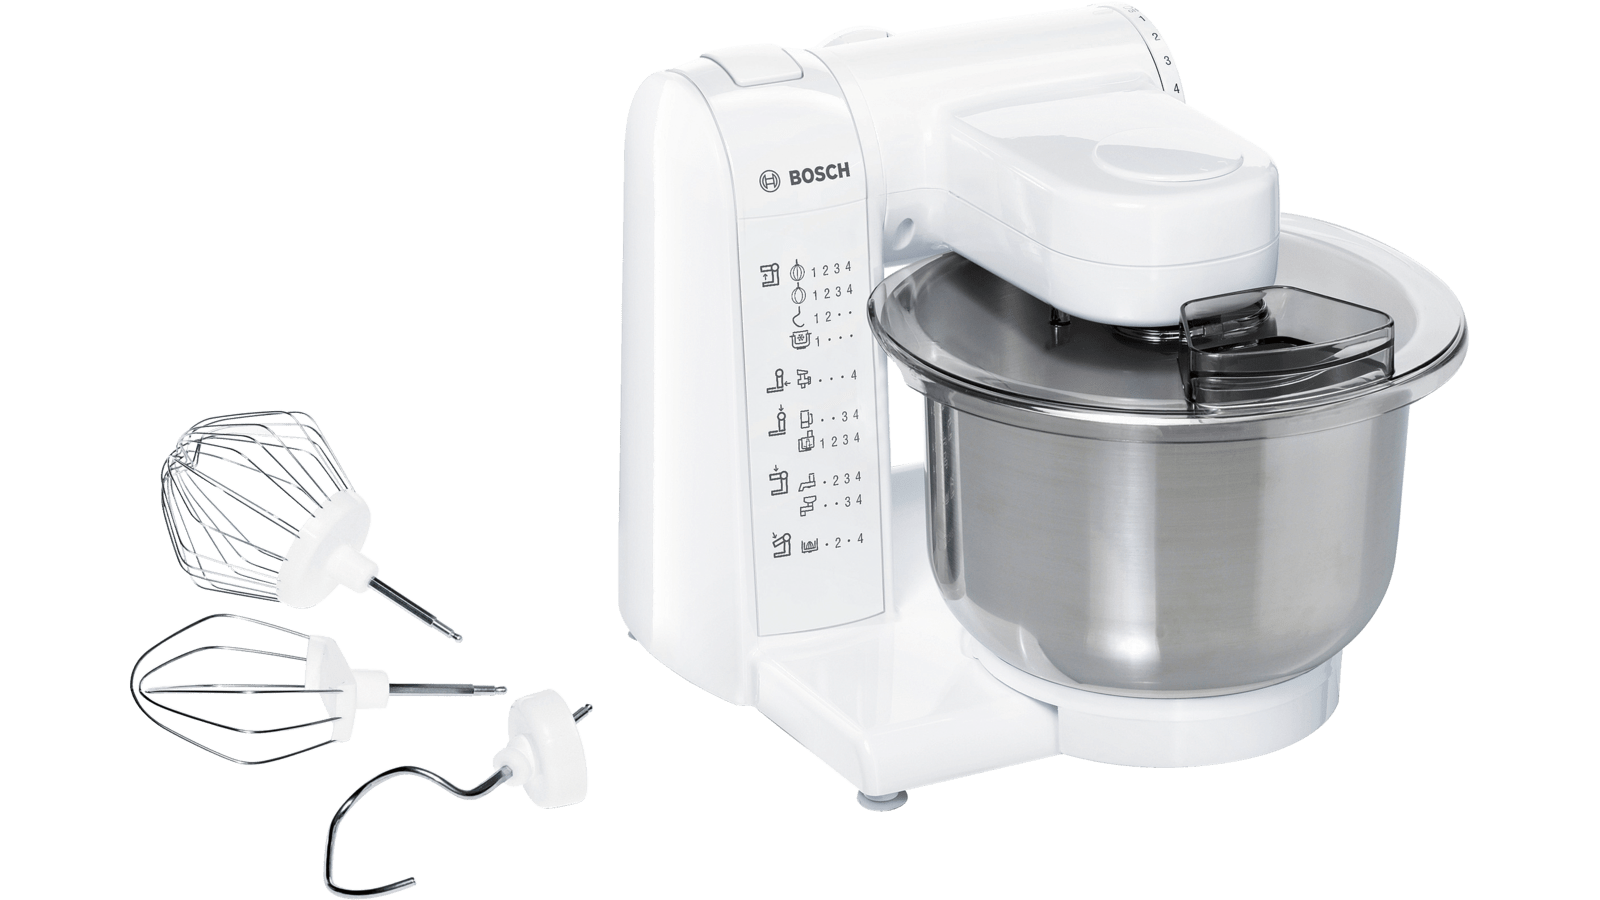 Bosch MUM4807GB Stand Mixer in White